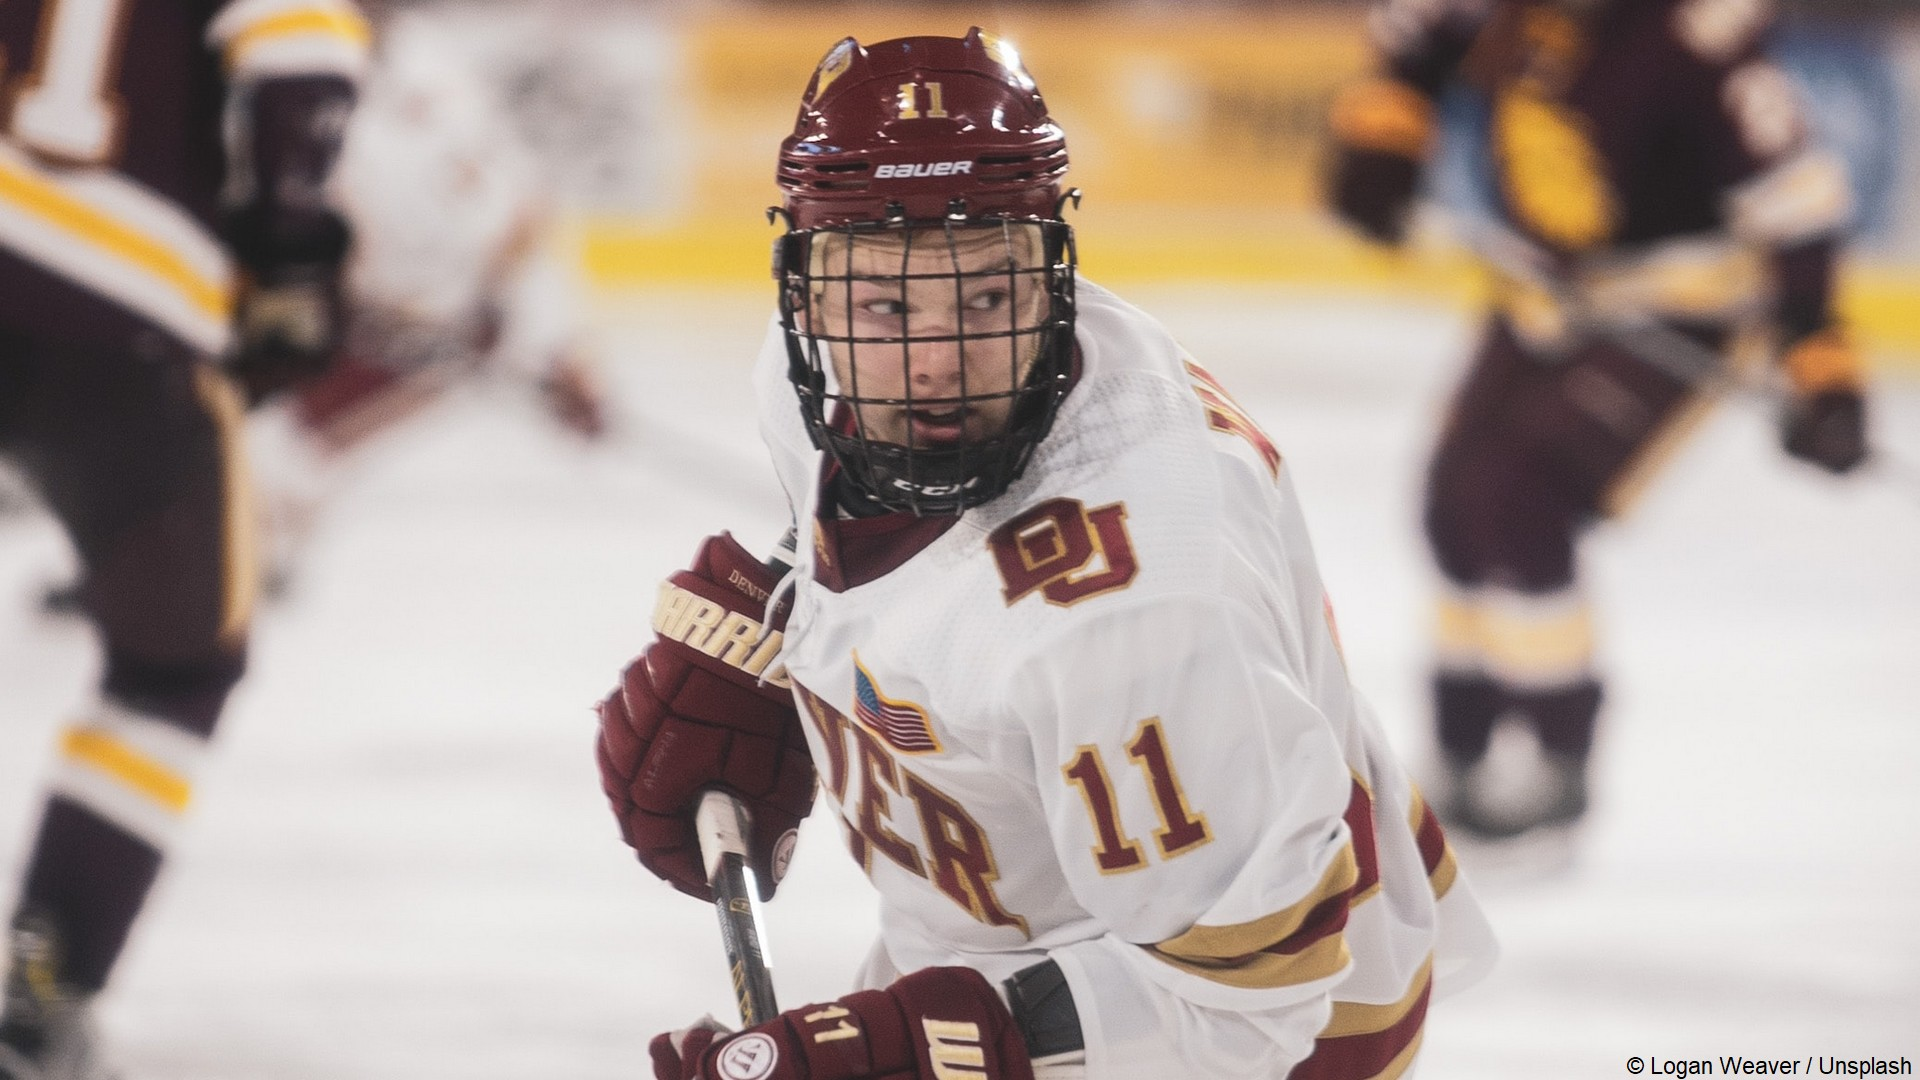 Hockey sur glace (2) (c) Logan Weaver Unsplash